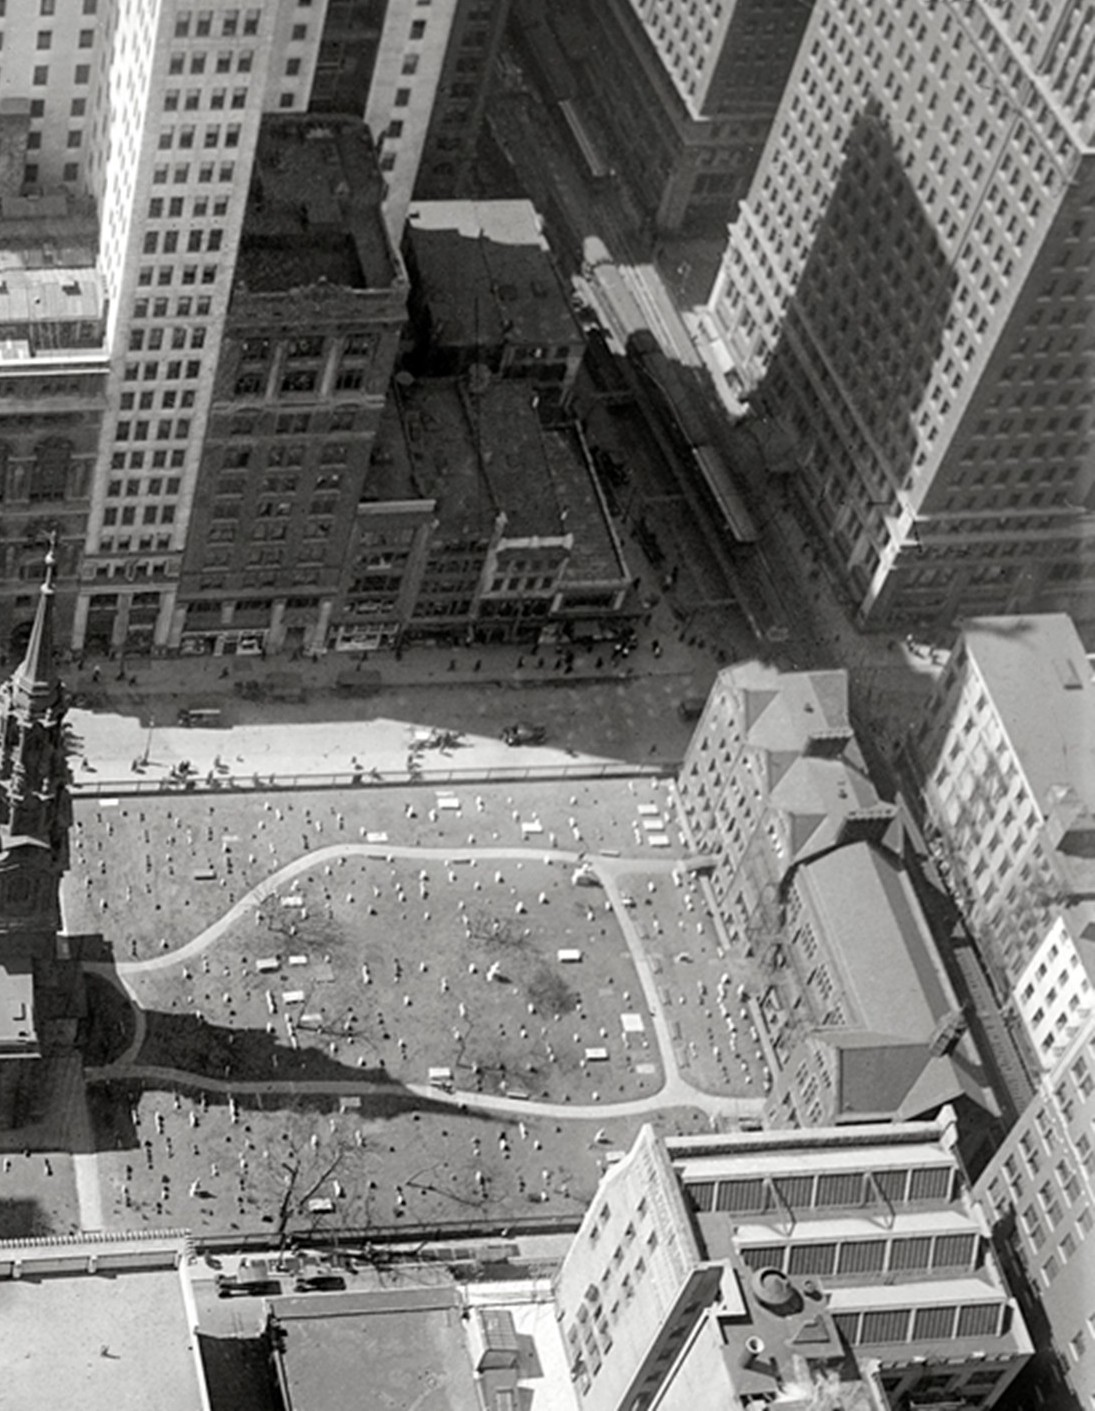 (325k, 1095x1411)<br><b>Country:</b> United States<br><b>City:</b> New York<br><b>System:</b> New York City Transit<br><b>Line:</b> 9th Avenue El<br><b>Location:</b> Cortlandt Street <br><b>Collection of:</b> Frank Pfuhler<br><b>Date:</b> 4/19/1919<br><b>Notes:</b> View south from Woolworth Building<br><b>Viewed (this week/total):</b> 0 / 1397